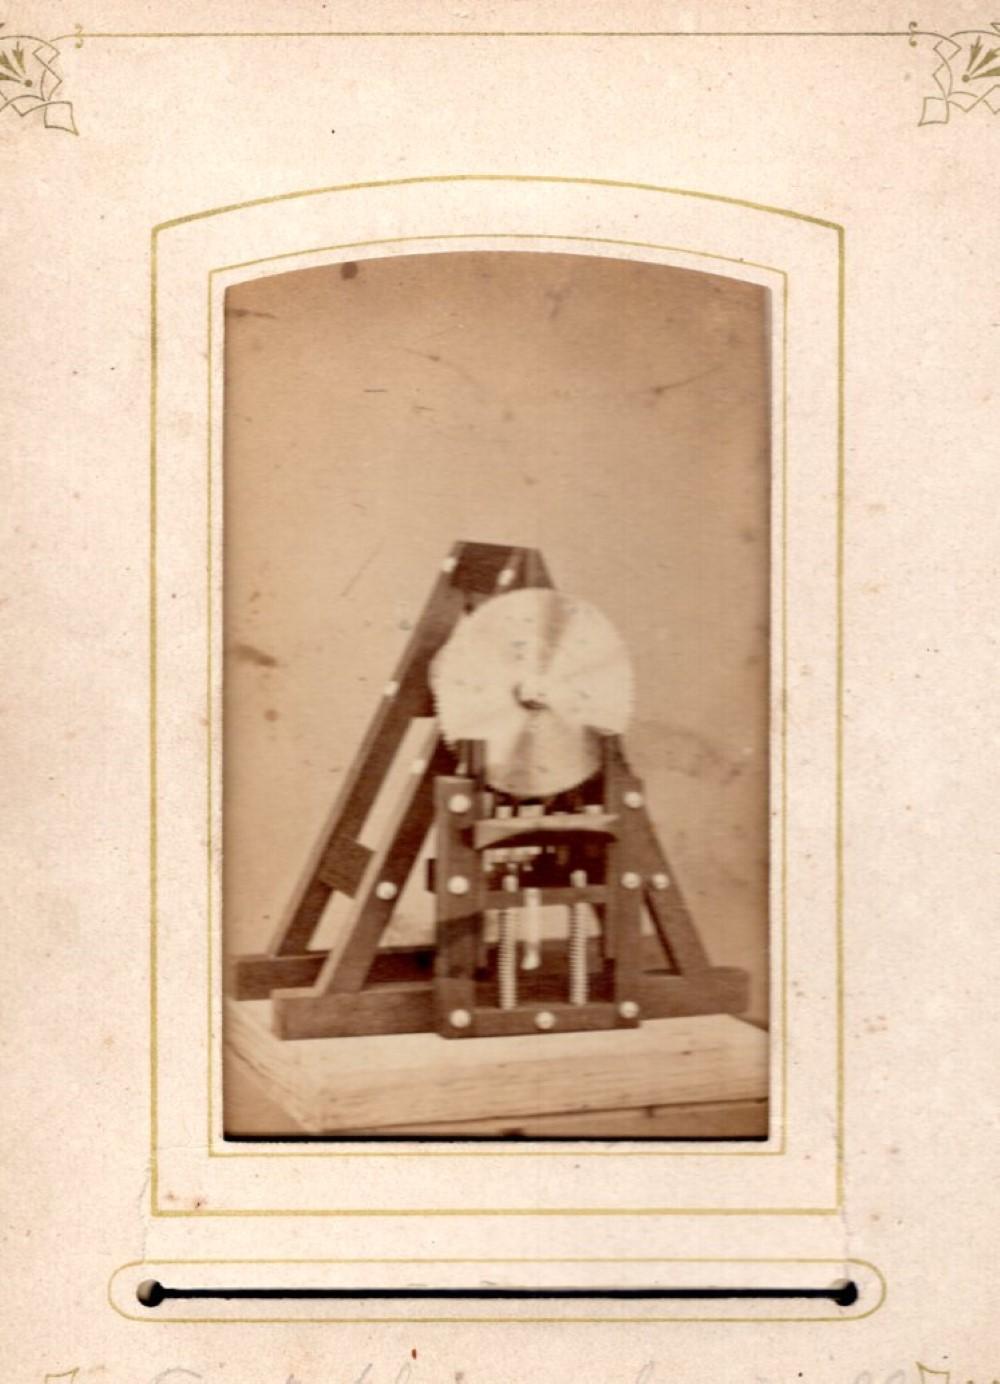 1860s newly invented shingle saw, uncommon CDV